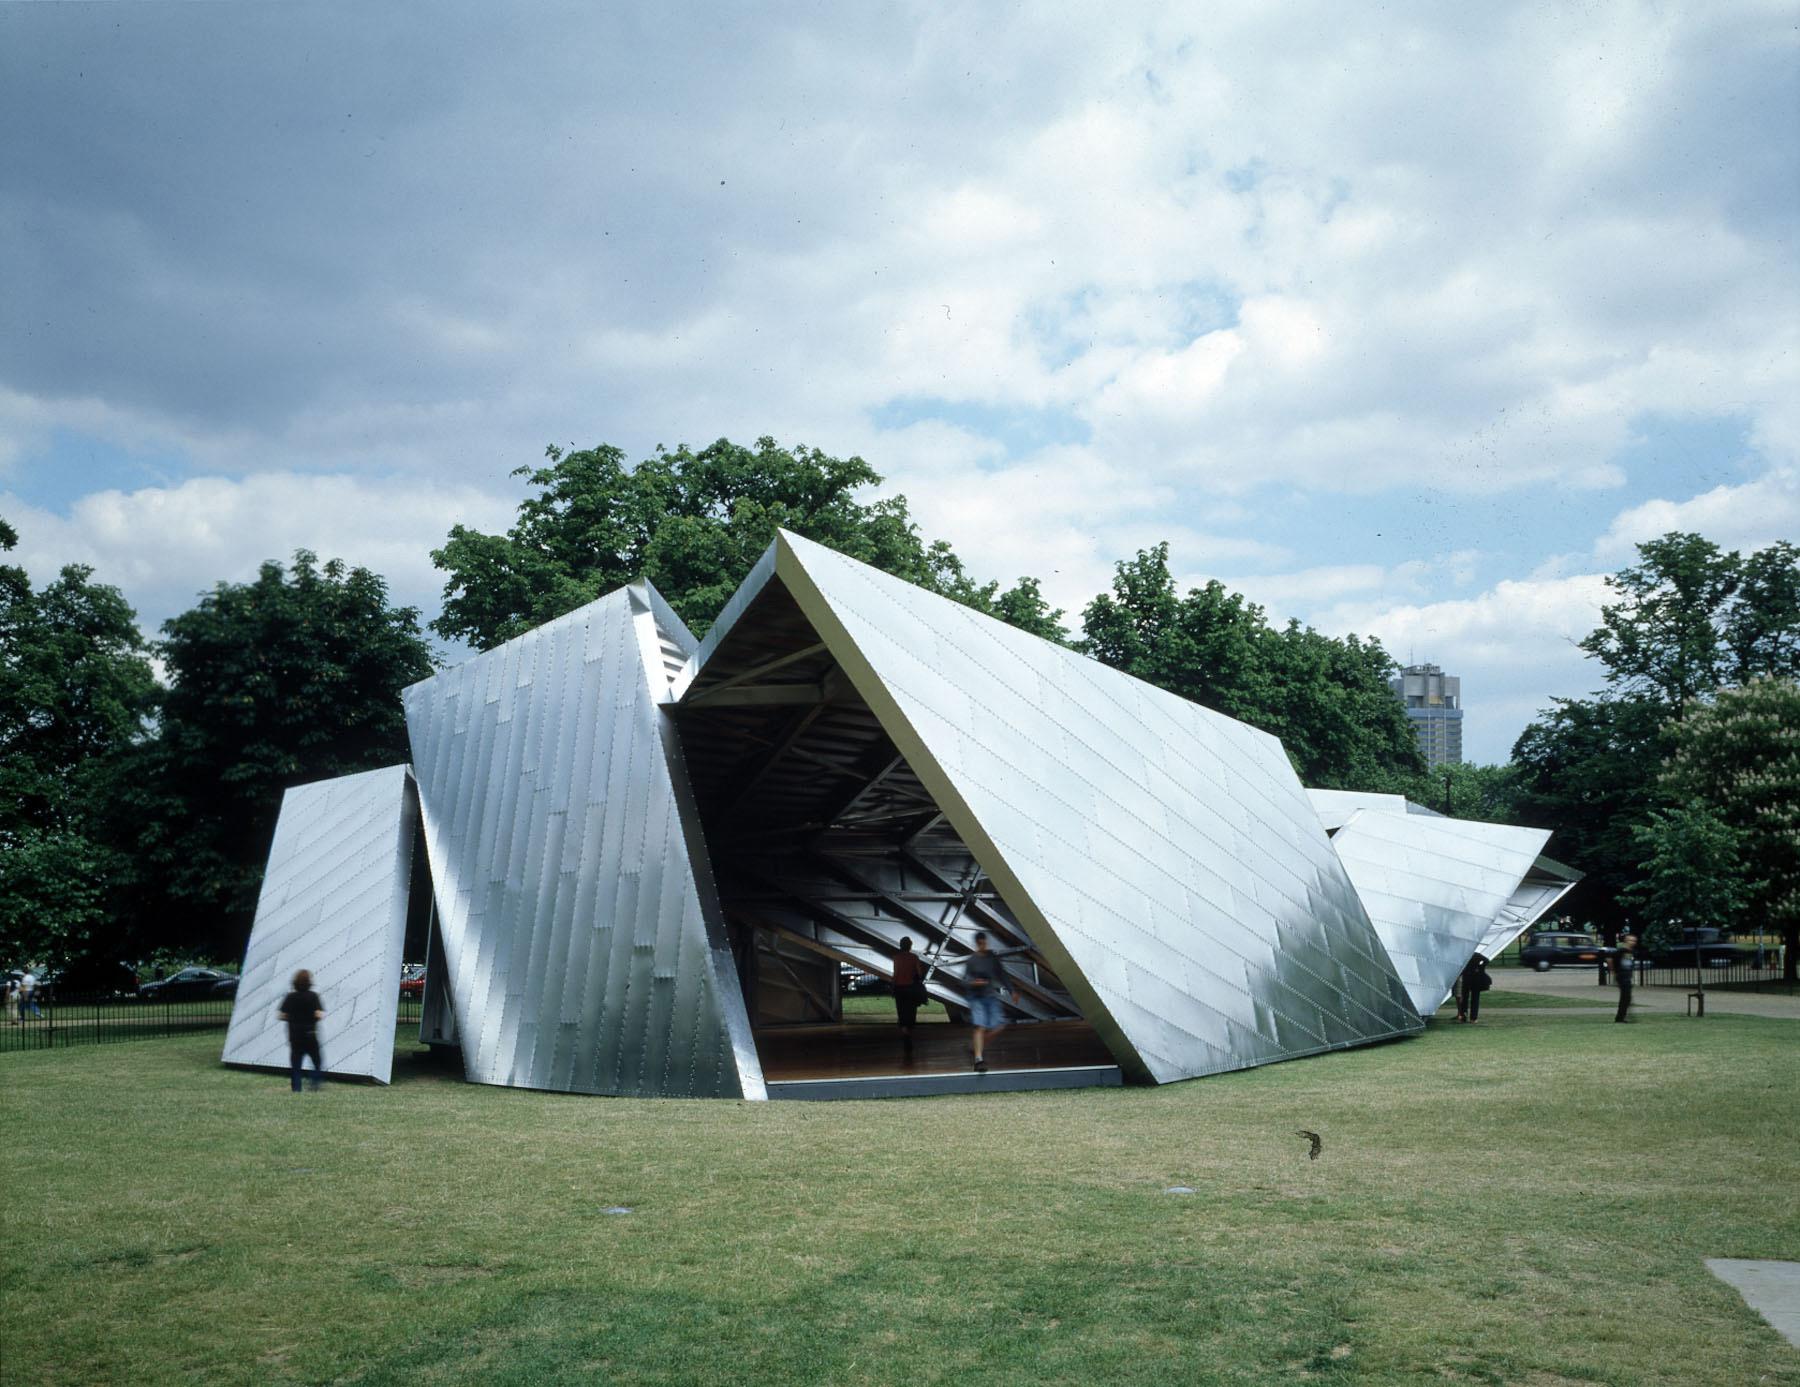 Serpentine Galleries Pavilion Every Design Since 2000